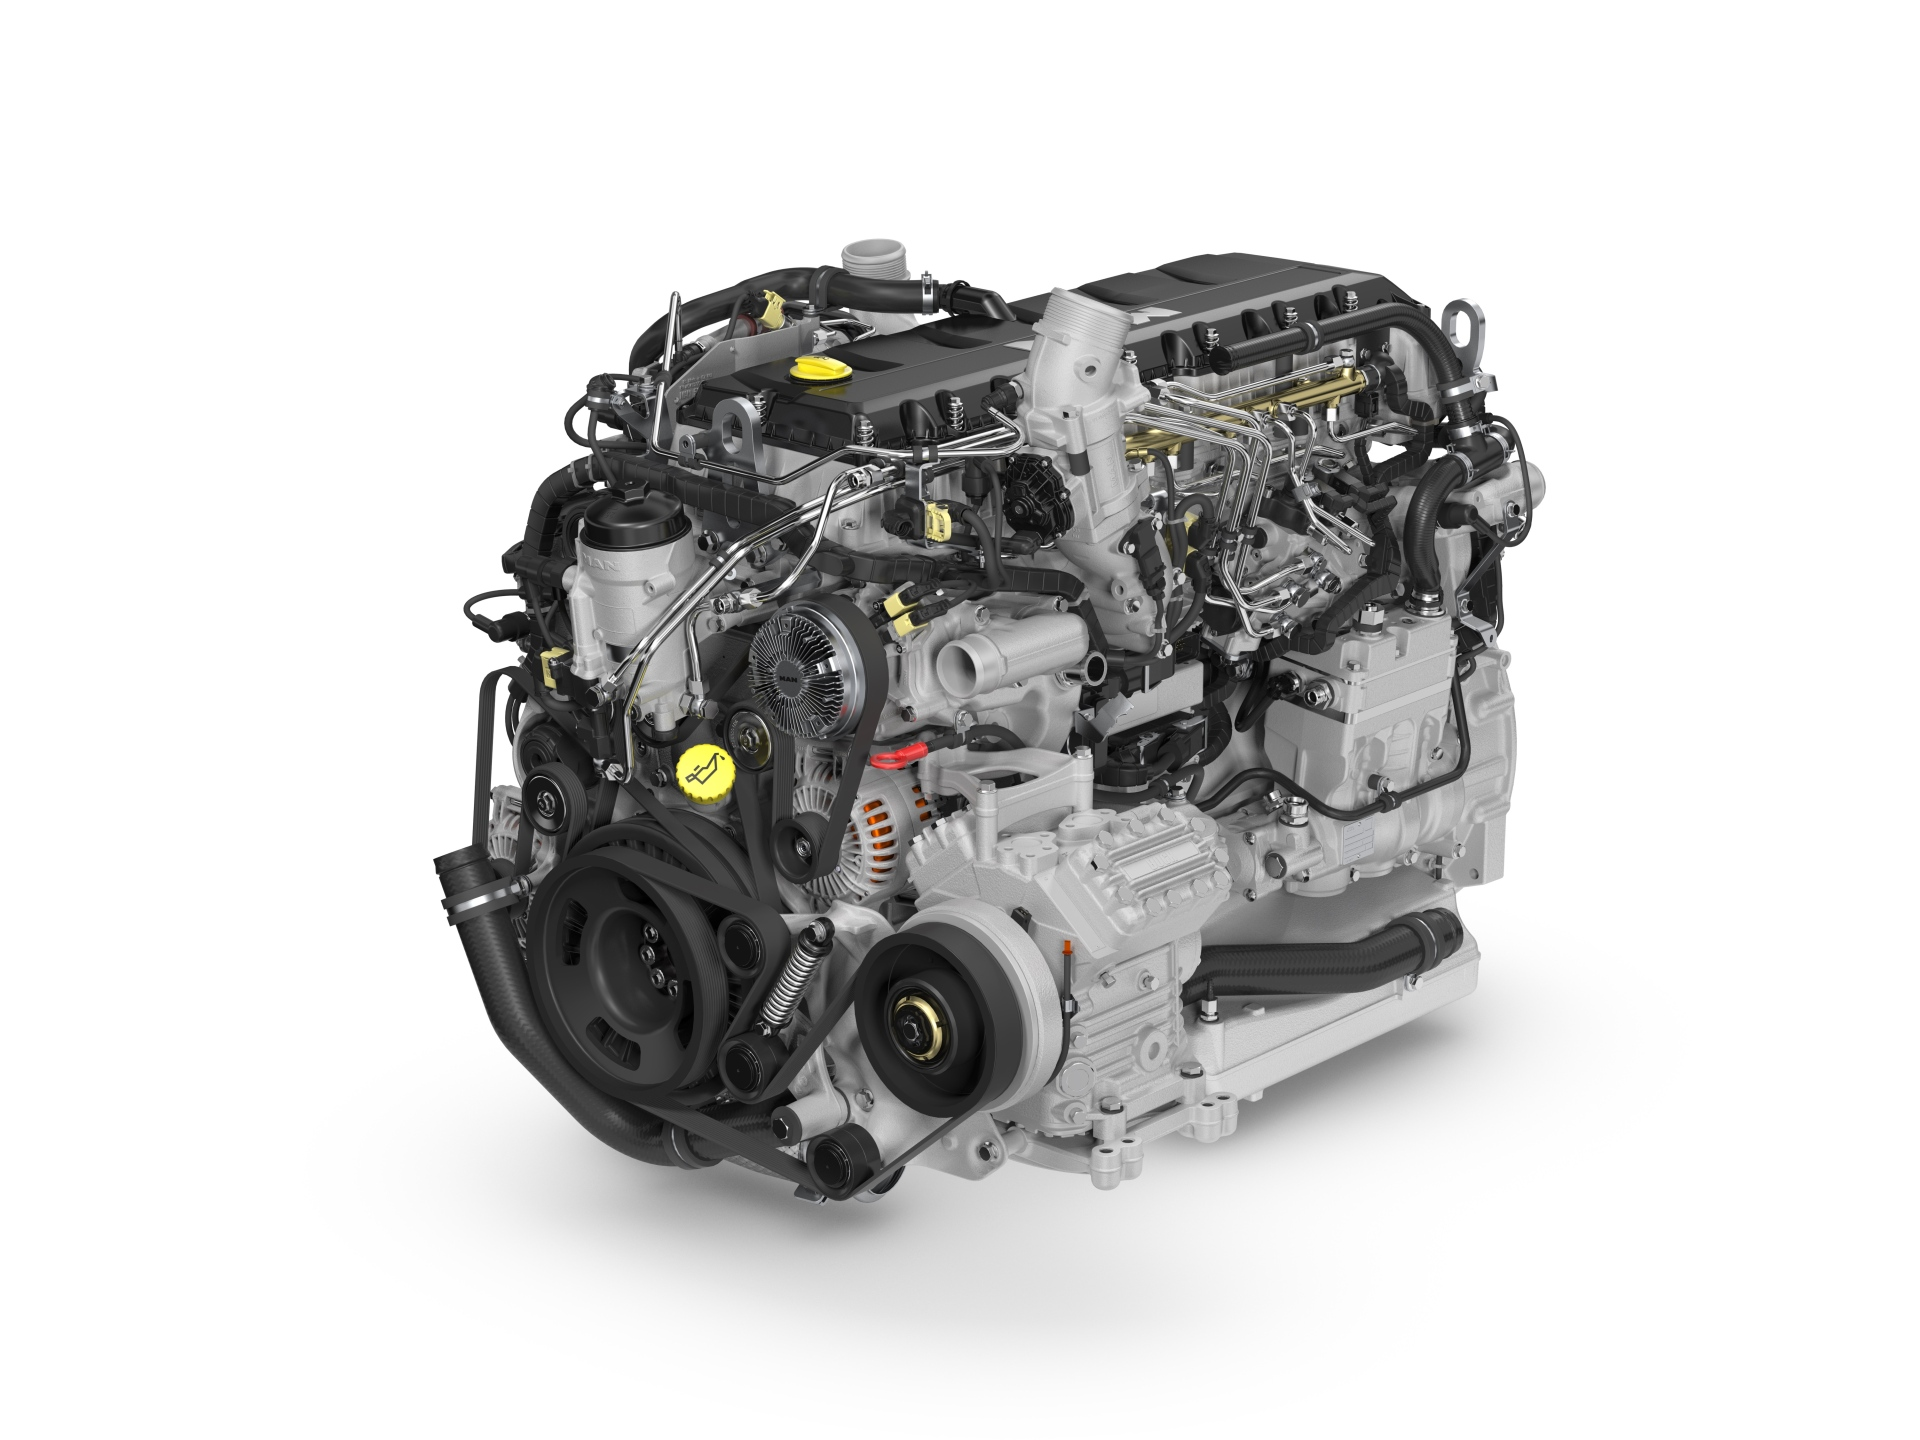 p_engine_d1556.jpg